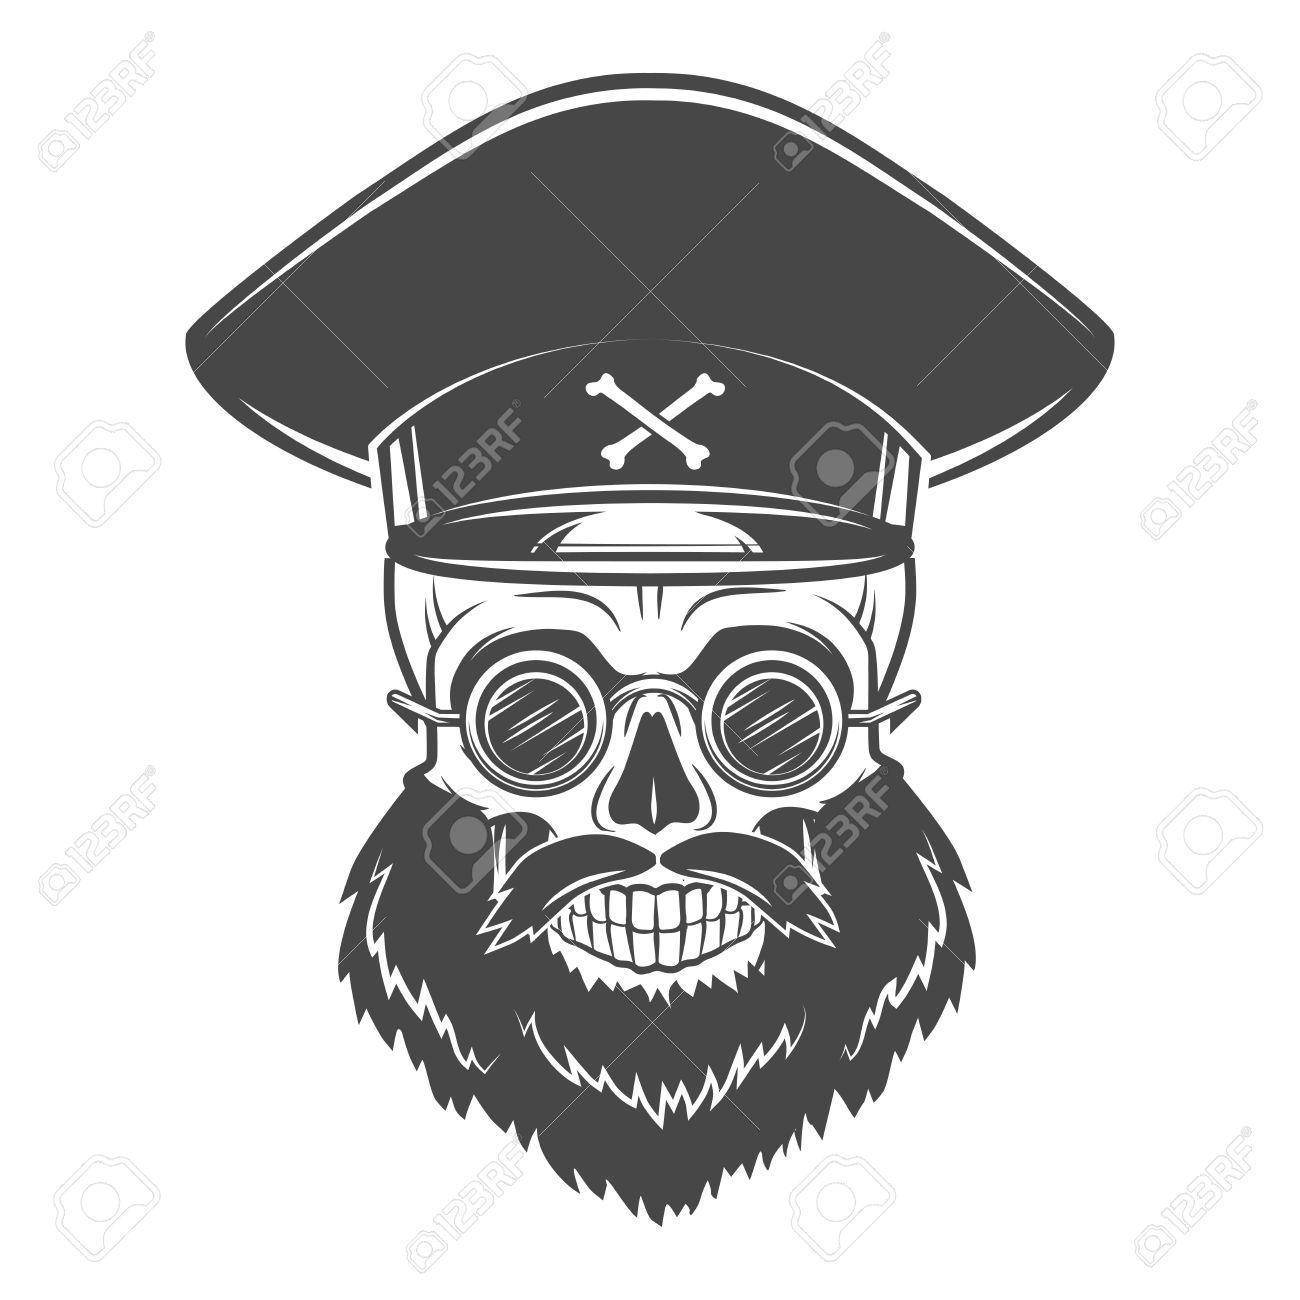 Bearded Skull with Captain cap and goggles. Dead crazy tyrant logo concept.  Vector dictator fba8a27e911